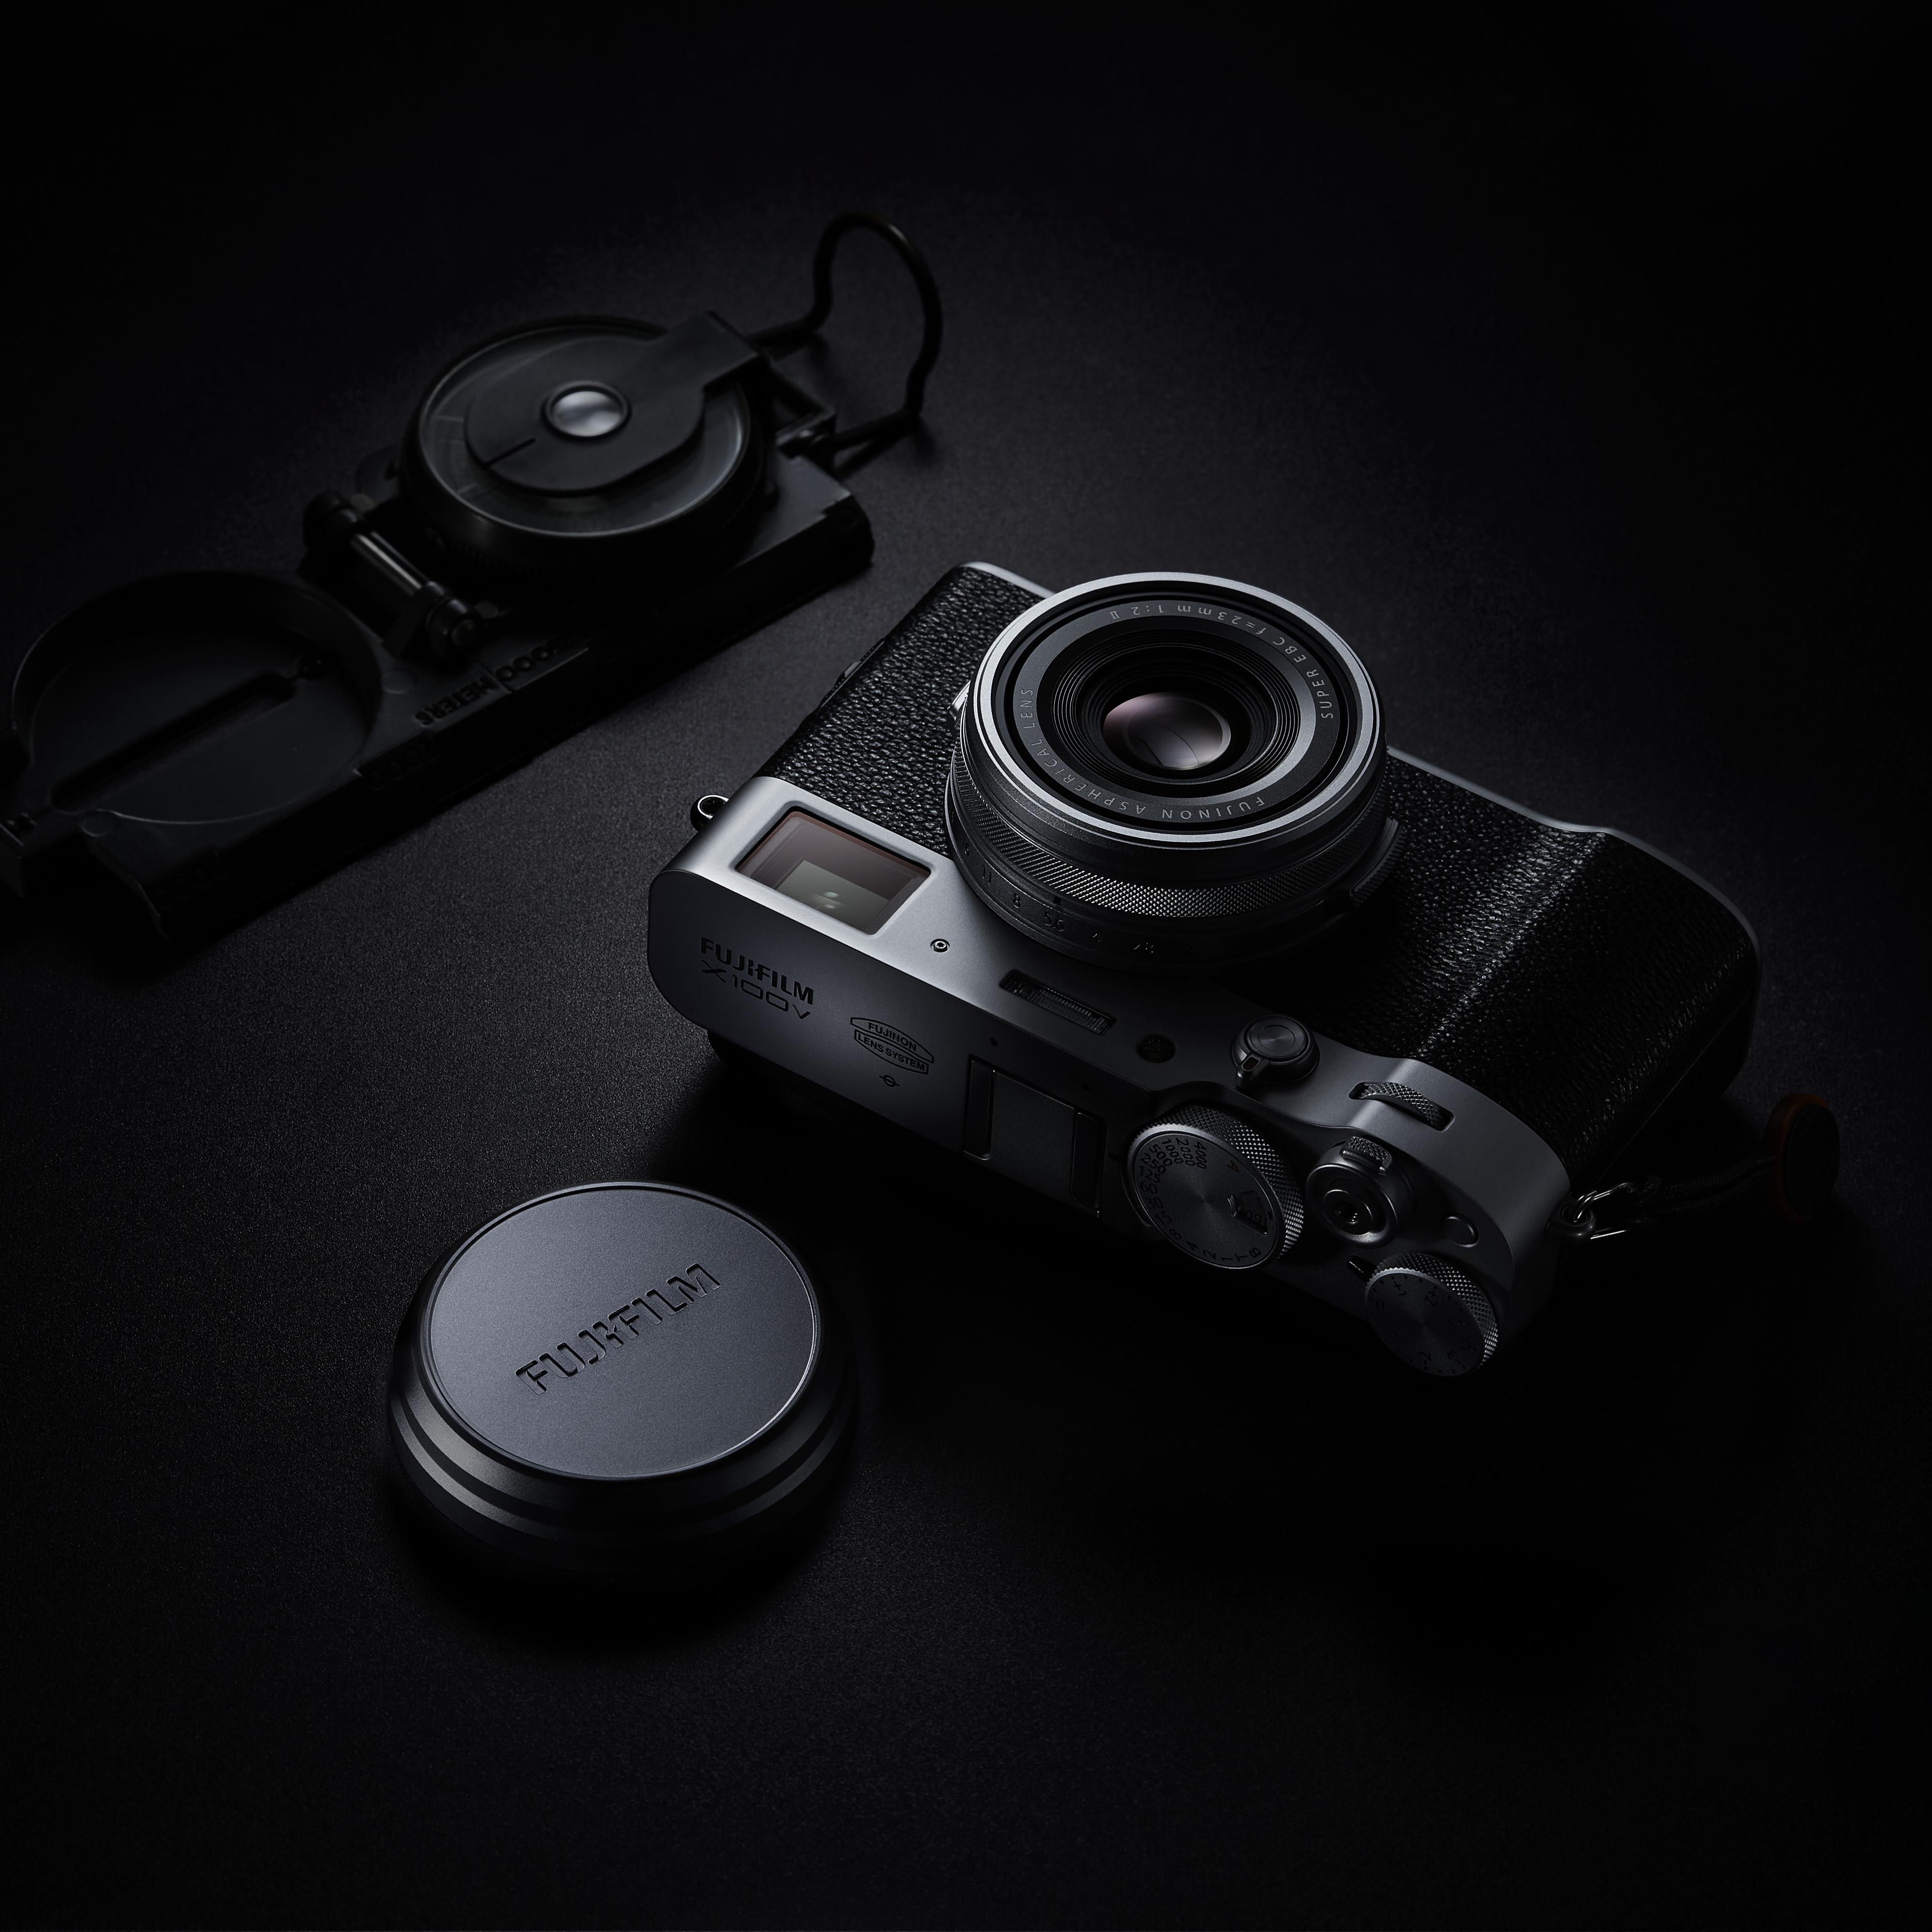 Best Fujifilm Camera for Travel